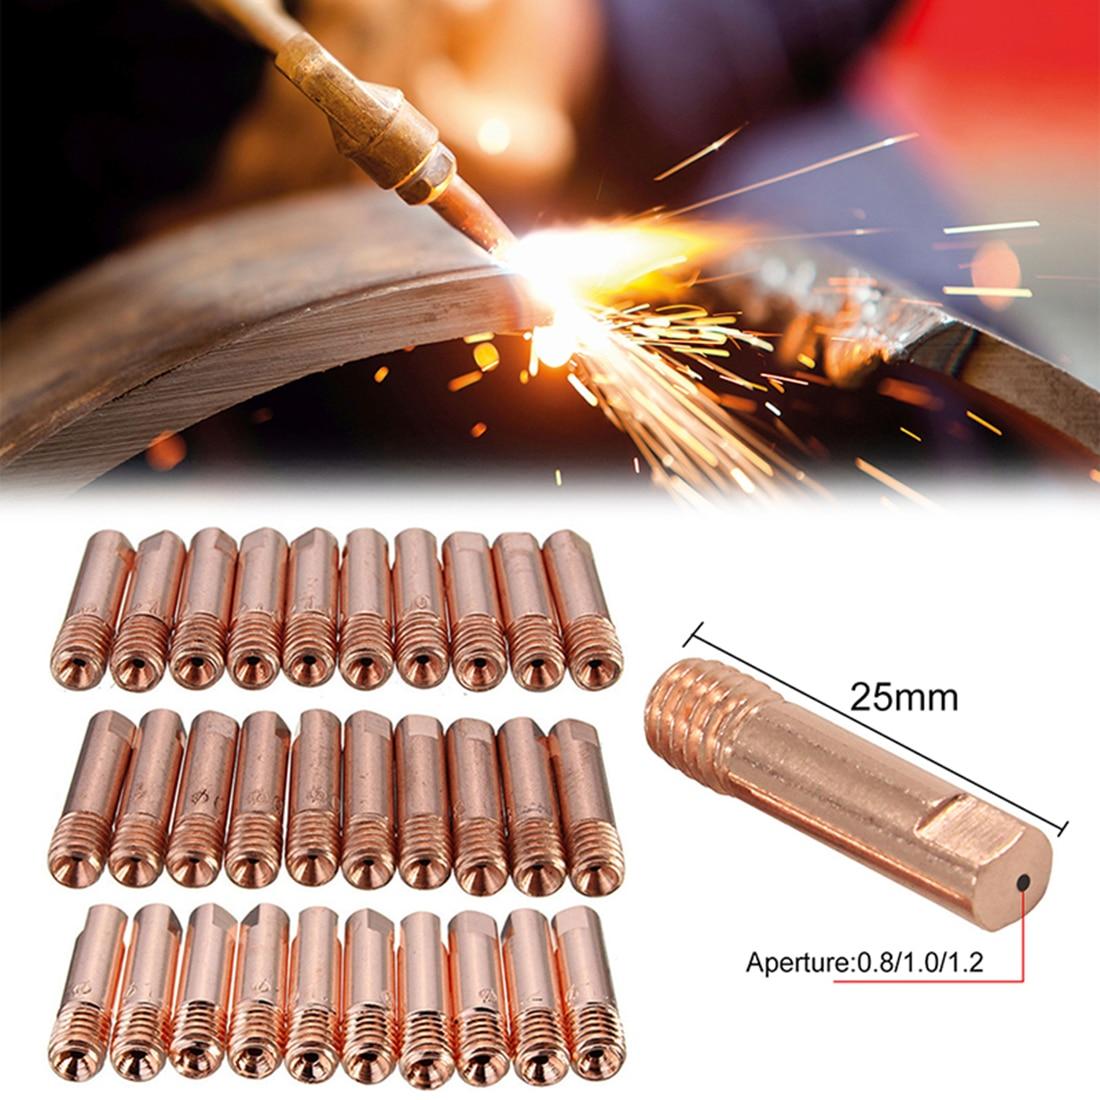 Hot 10pcs MB-15AK M6*25mm Welding Torch Contact Tip Gas Nozzle 0.8/1.0/1.2mm Mig Welding Gun Accessories Torch Contact Tip